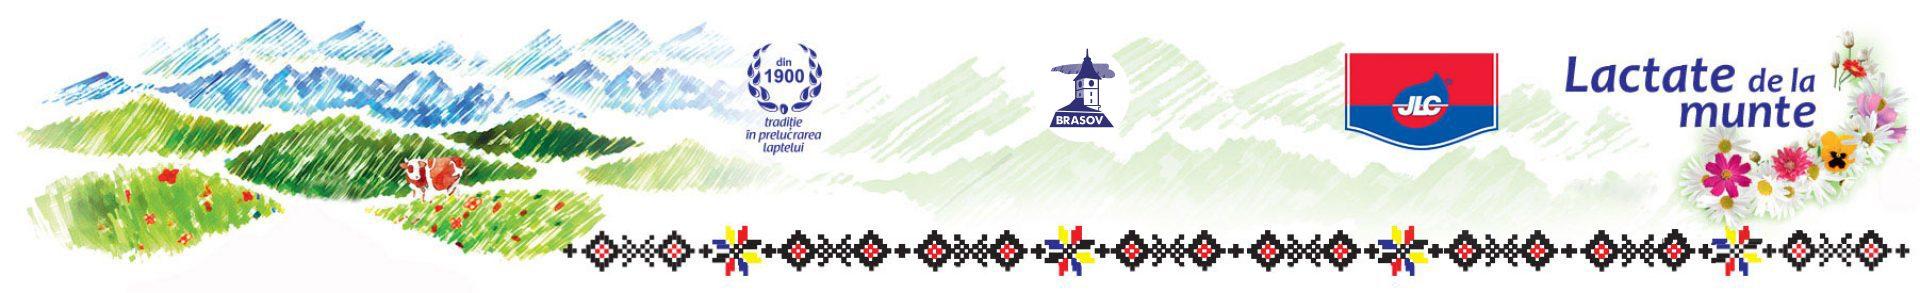 header-full-hd-cu-logo-nr9z0bldbabggy1ug12xrnexnm1mnu81paxmrjfipe (1)